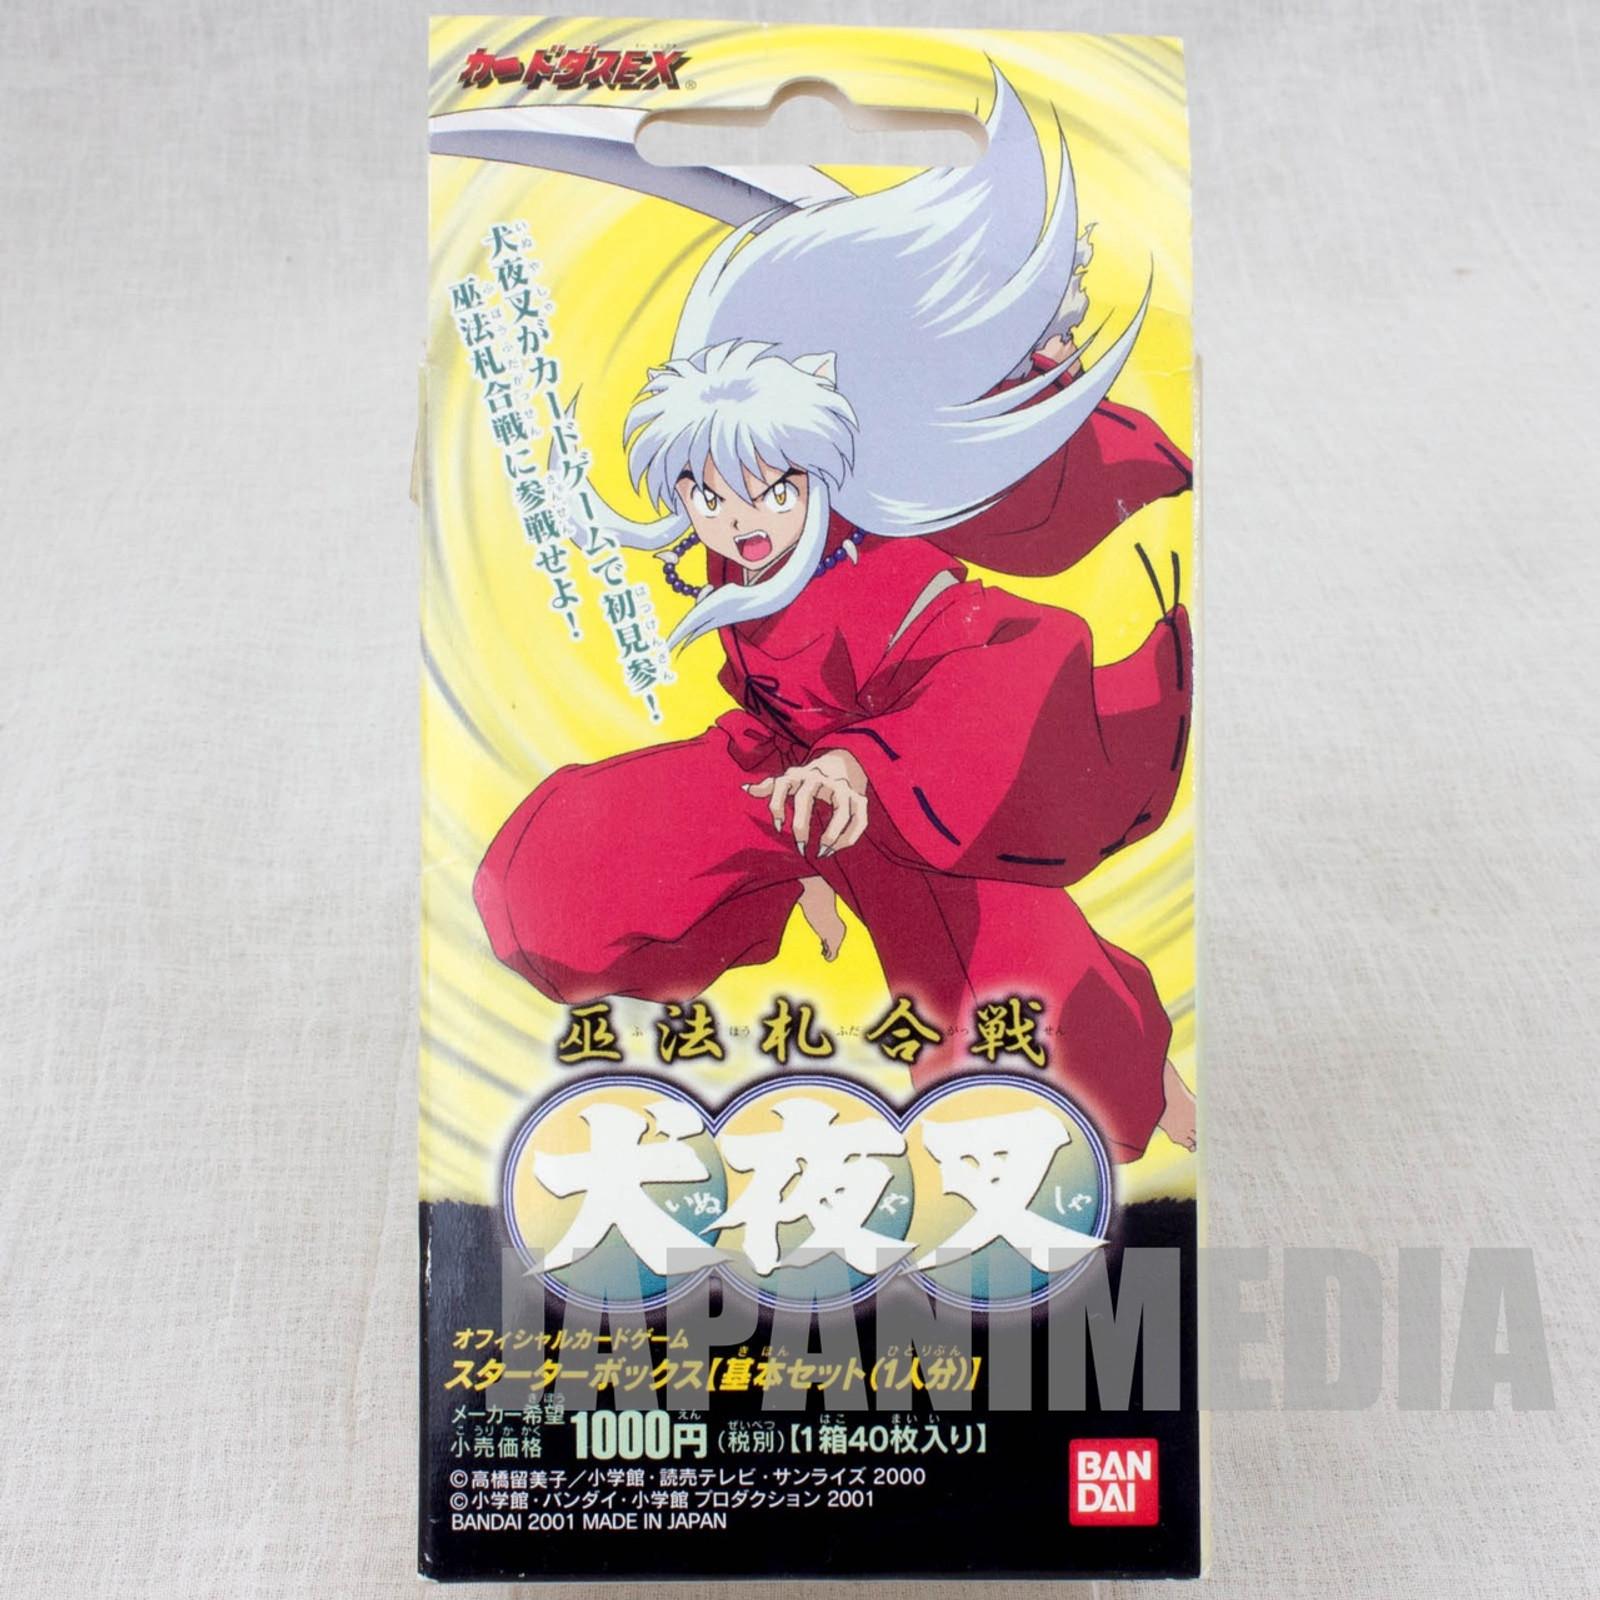 Inuyasha Carddas EX Starter Box 40 cards Set BANDAI JAPAN ANIME MANGA